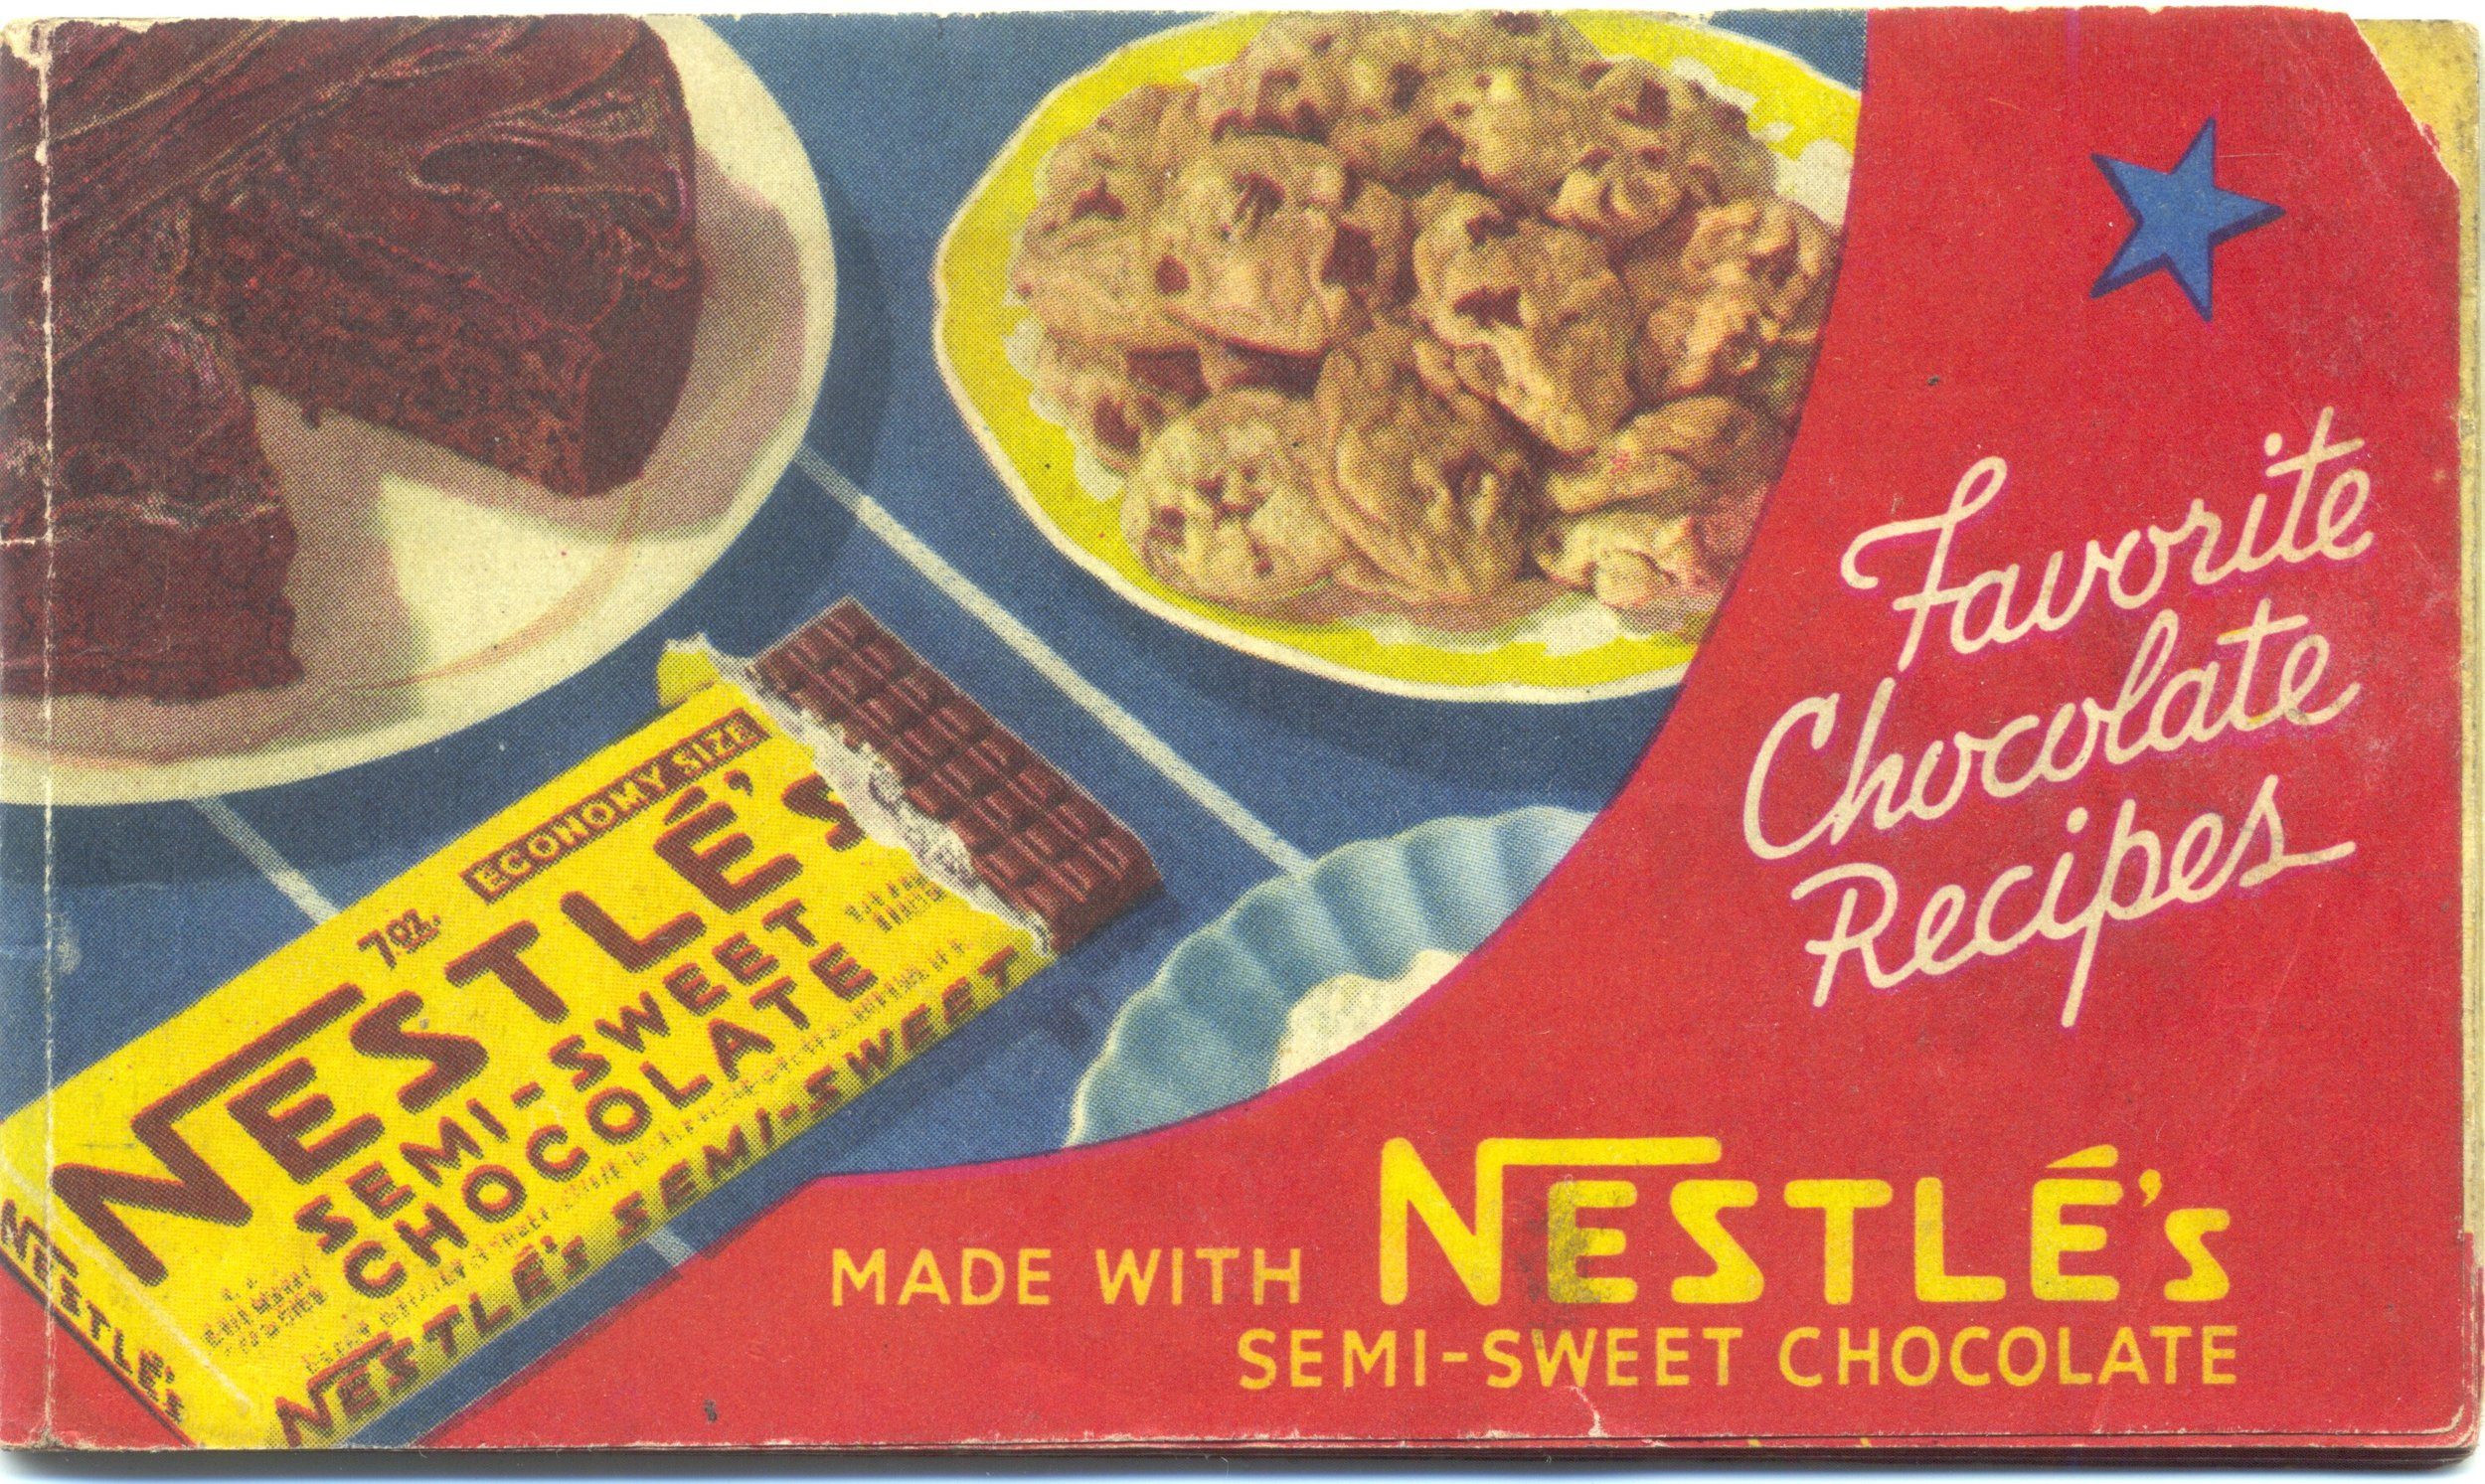 1941 Favorite Chocolate Recipes by Nestlé's Chocolate